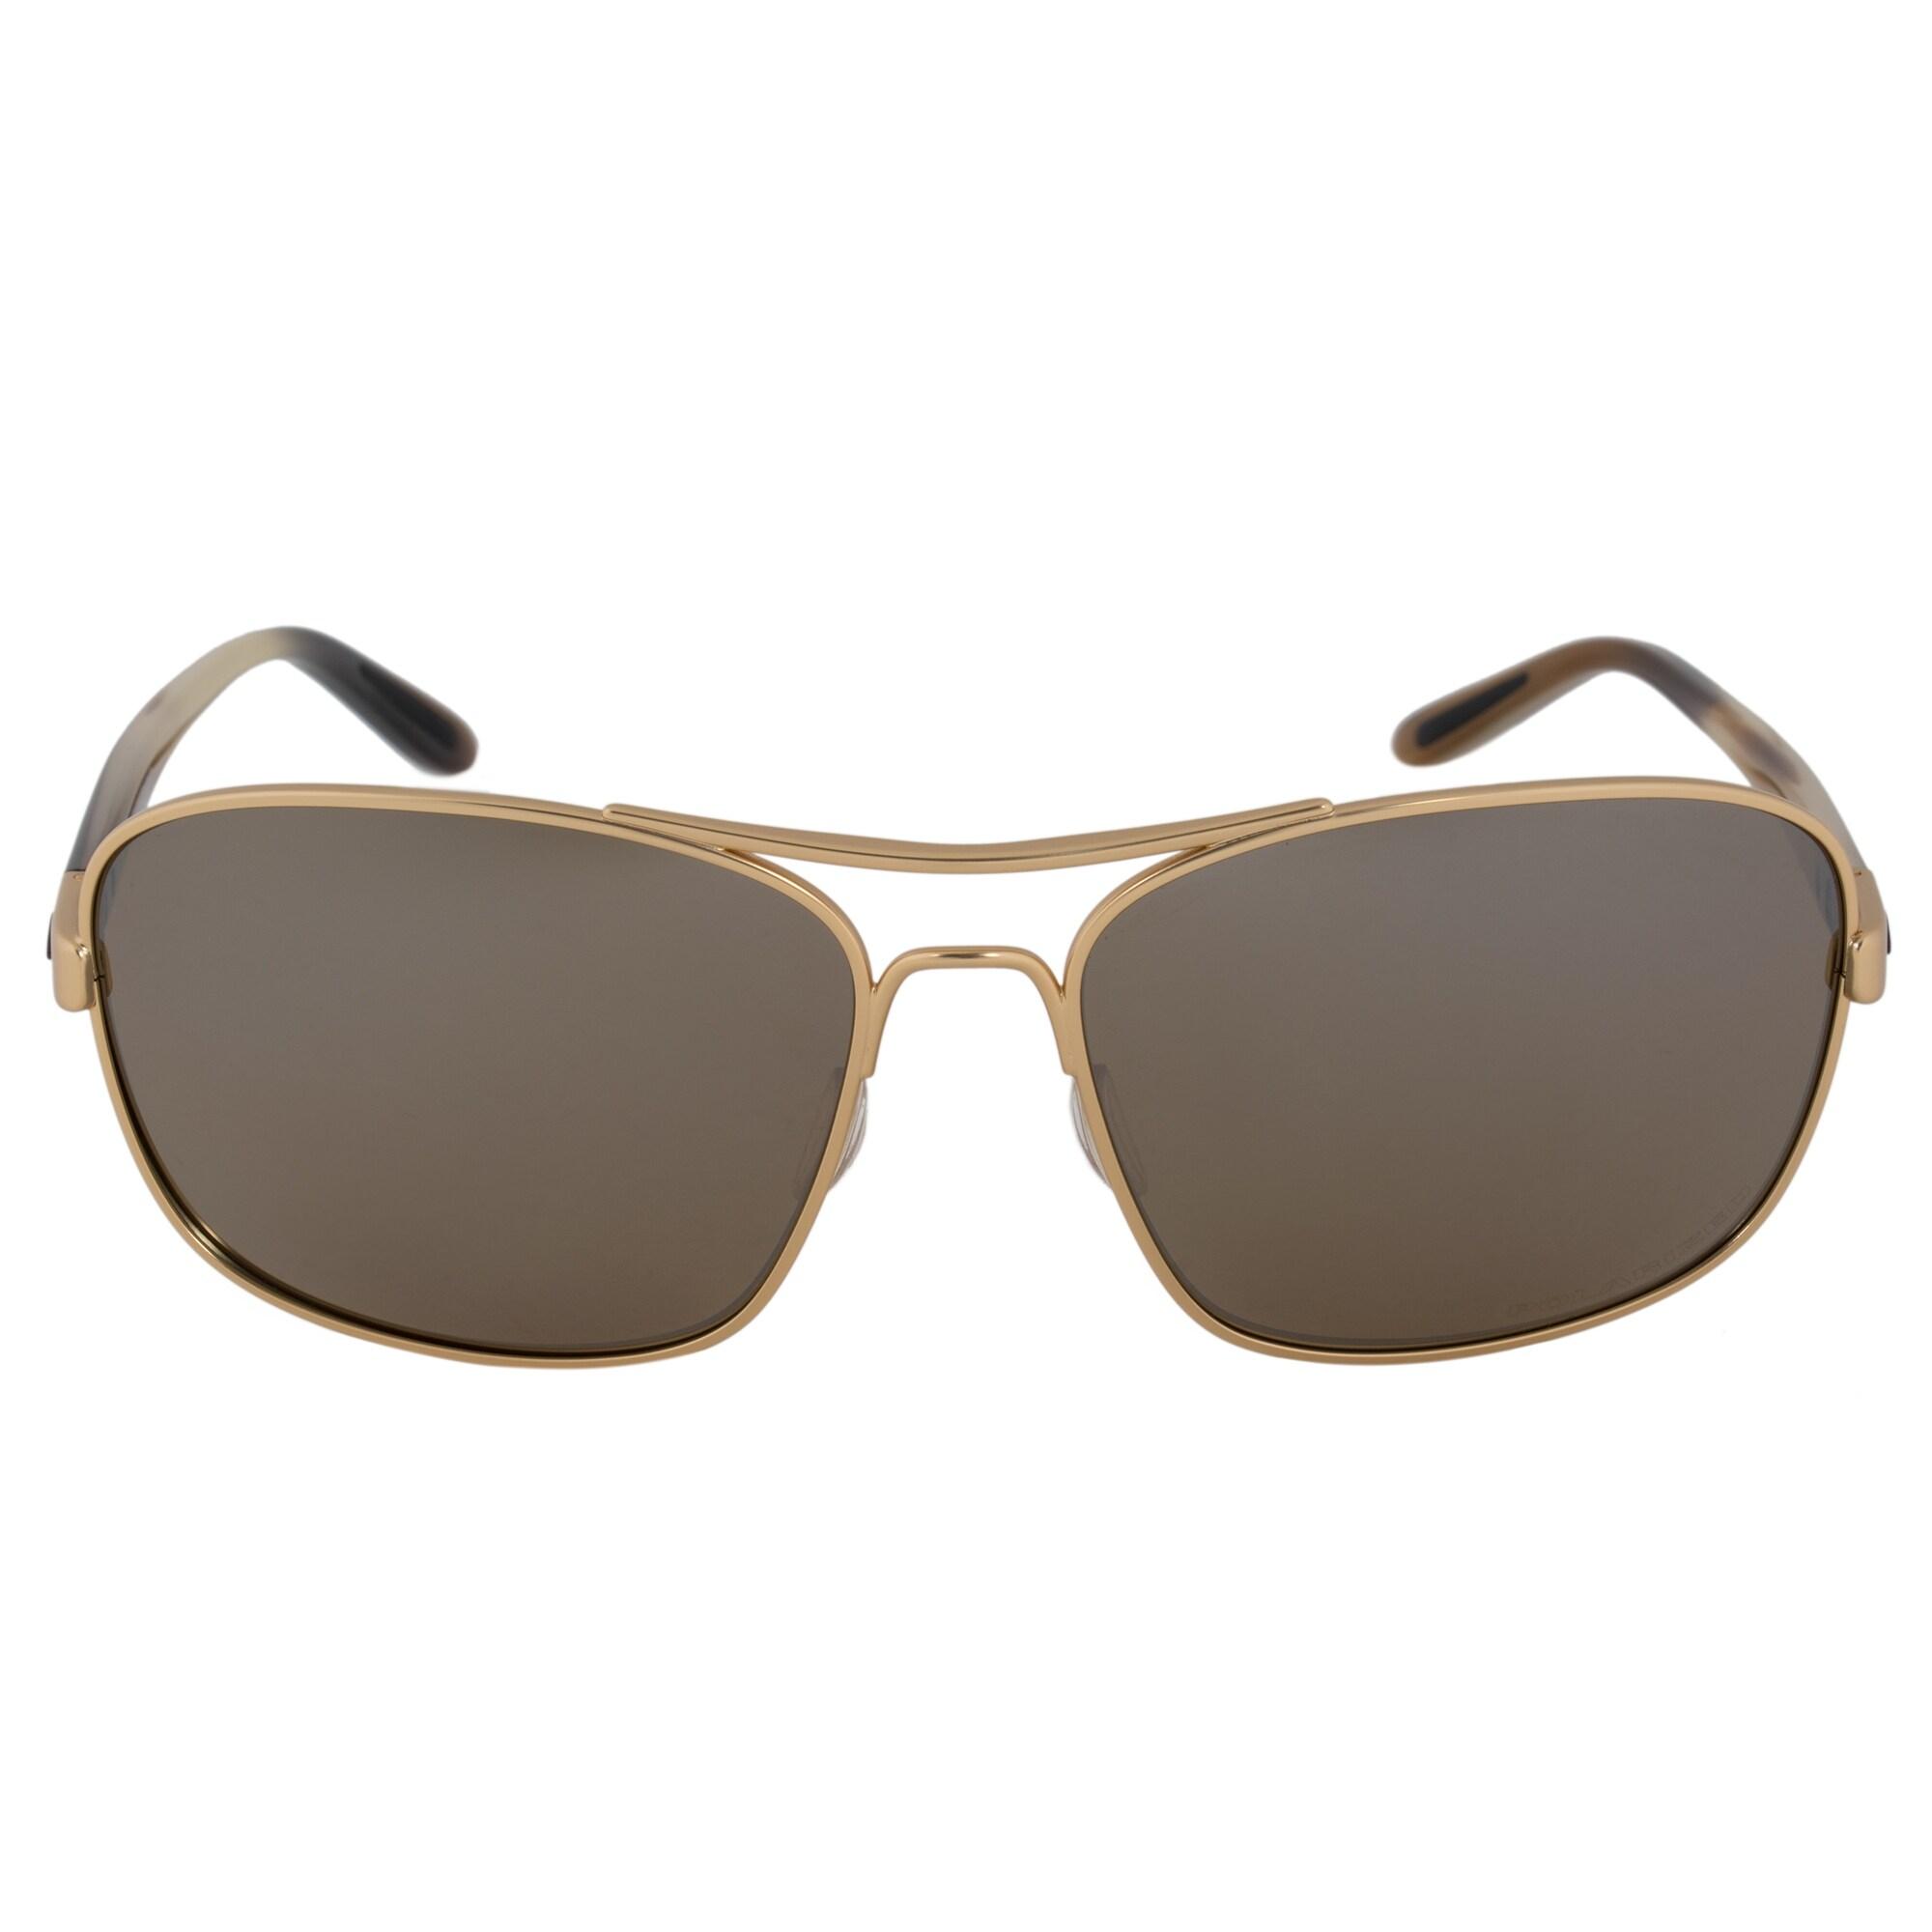 c3c86c5663e Shop Oakley Sanctuary Square Sunglasses 0OO4116 411605 58